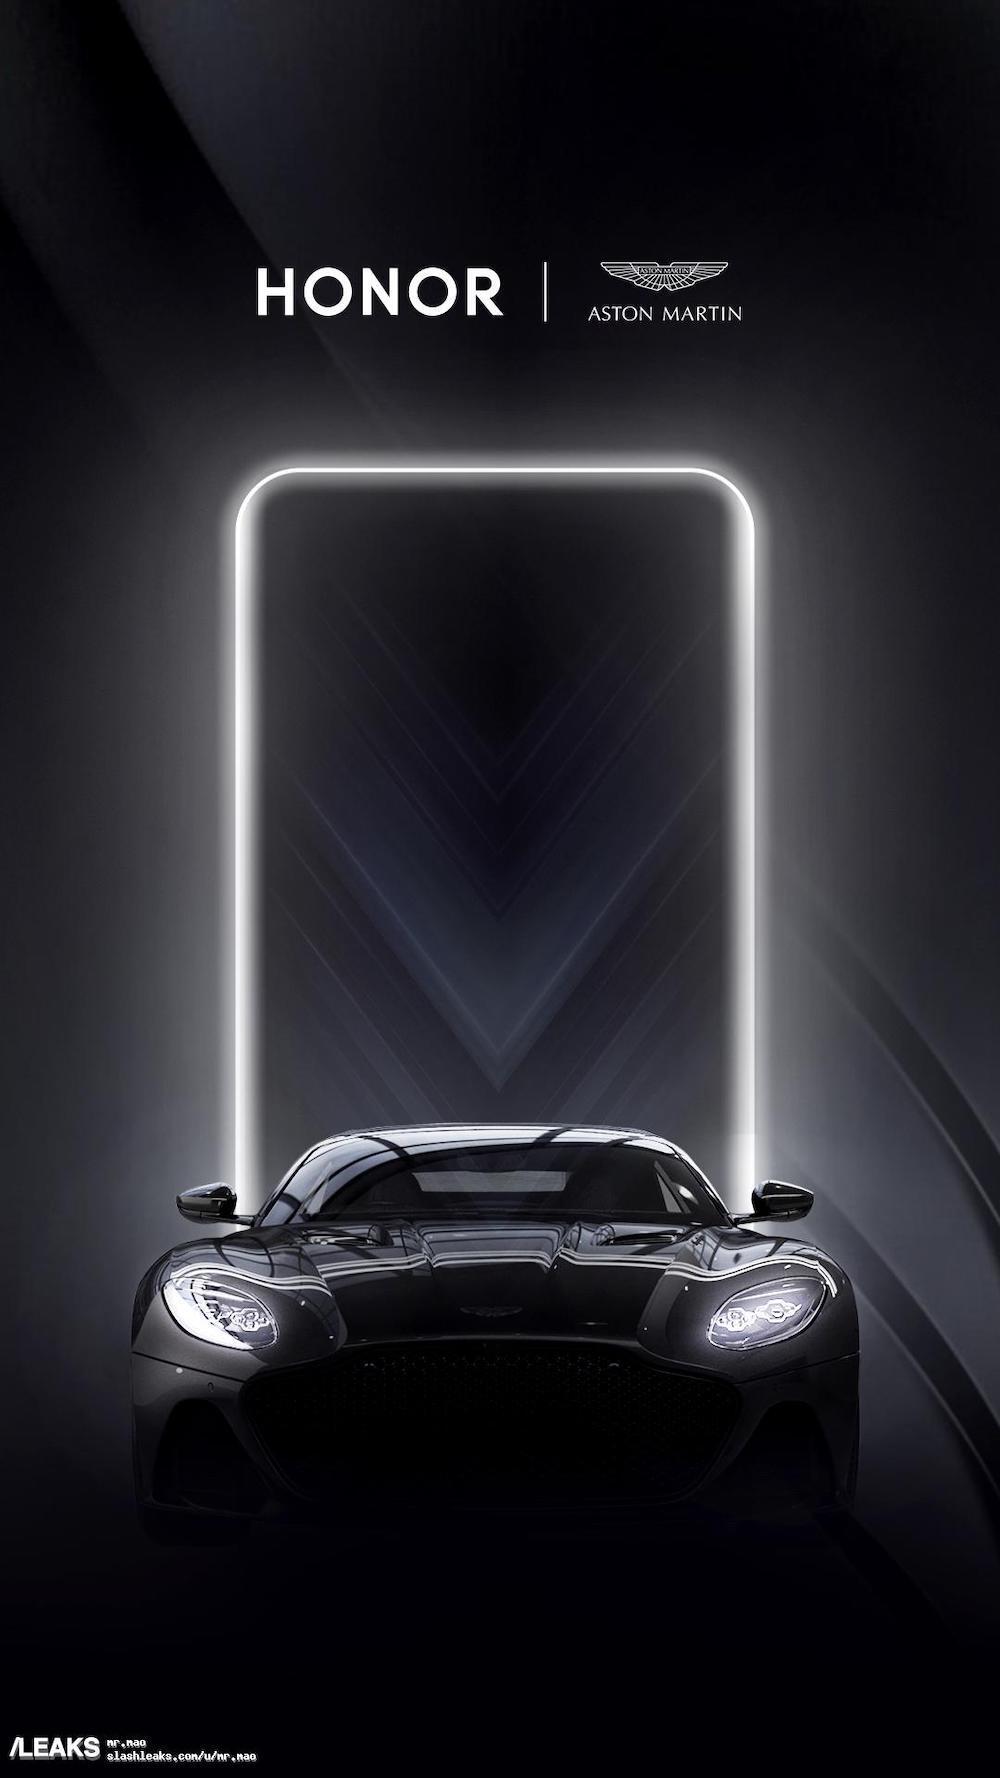 Honor Aston Martin